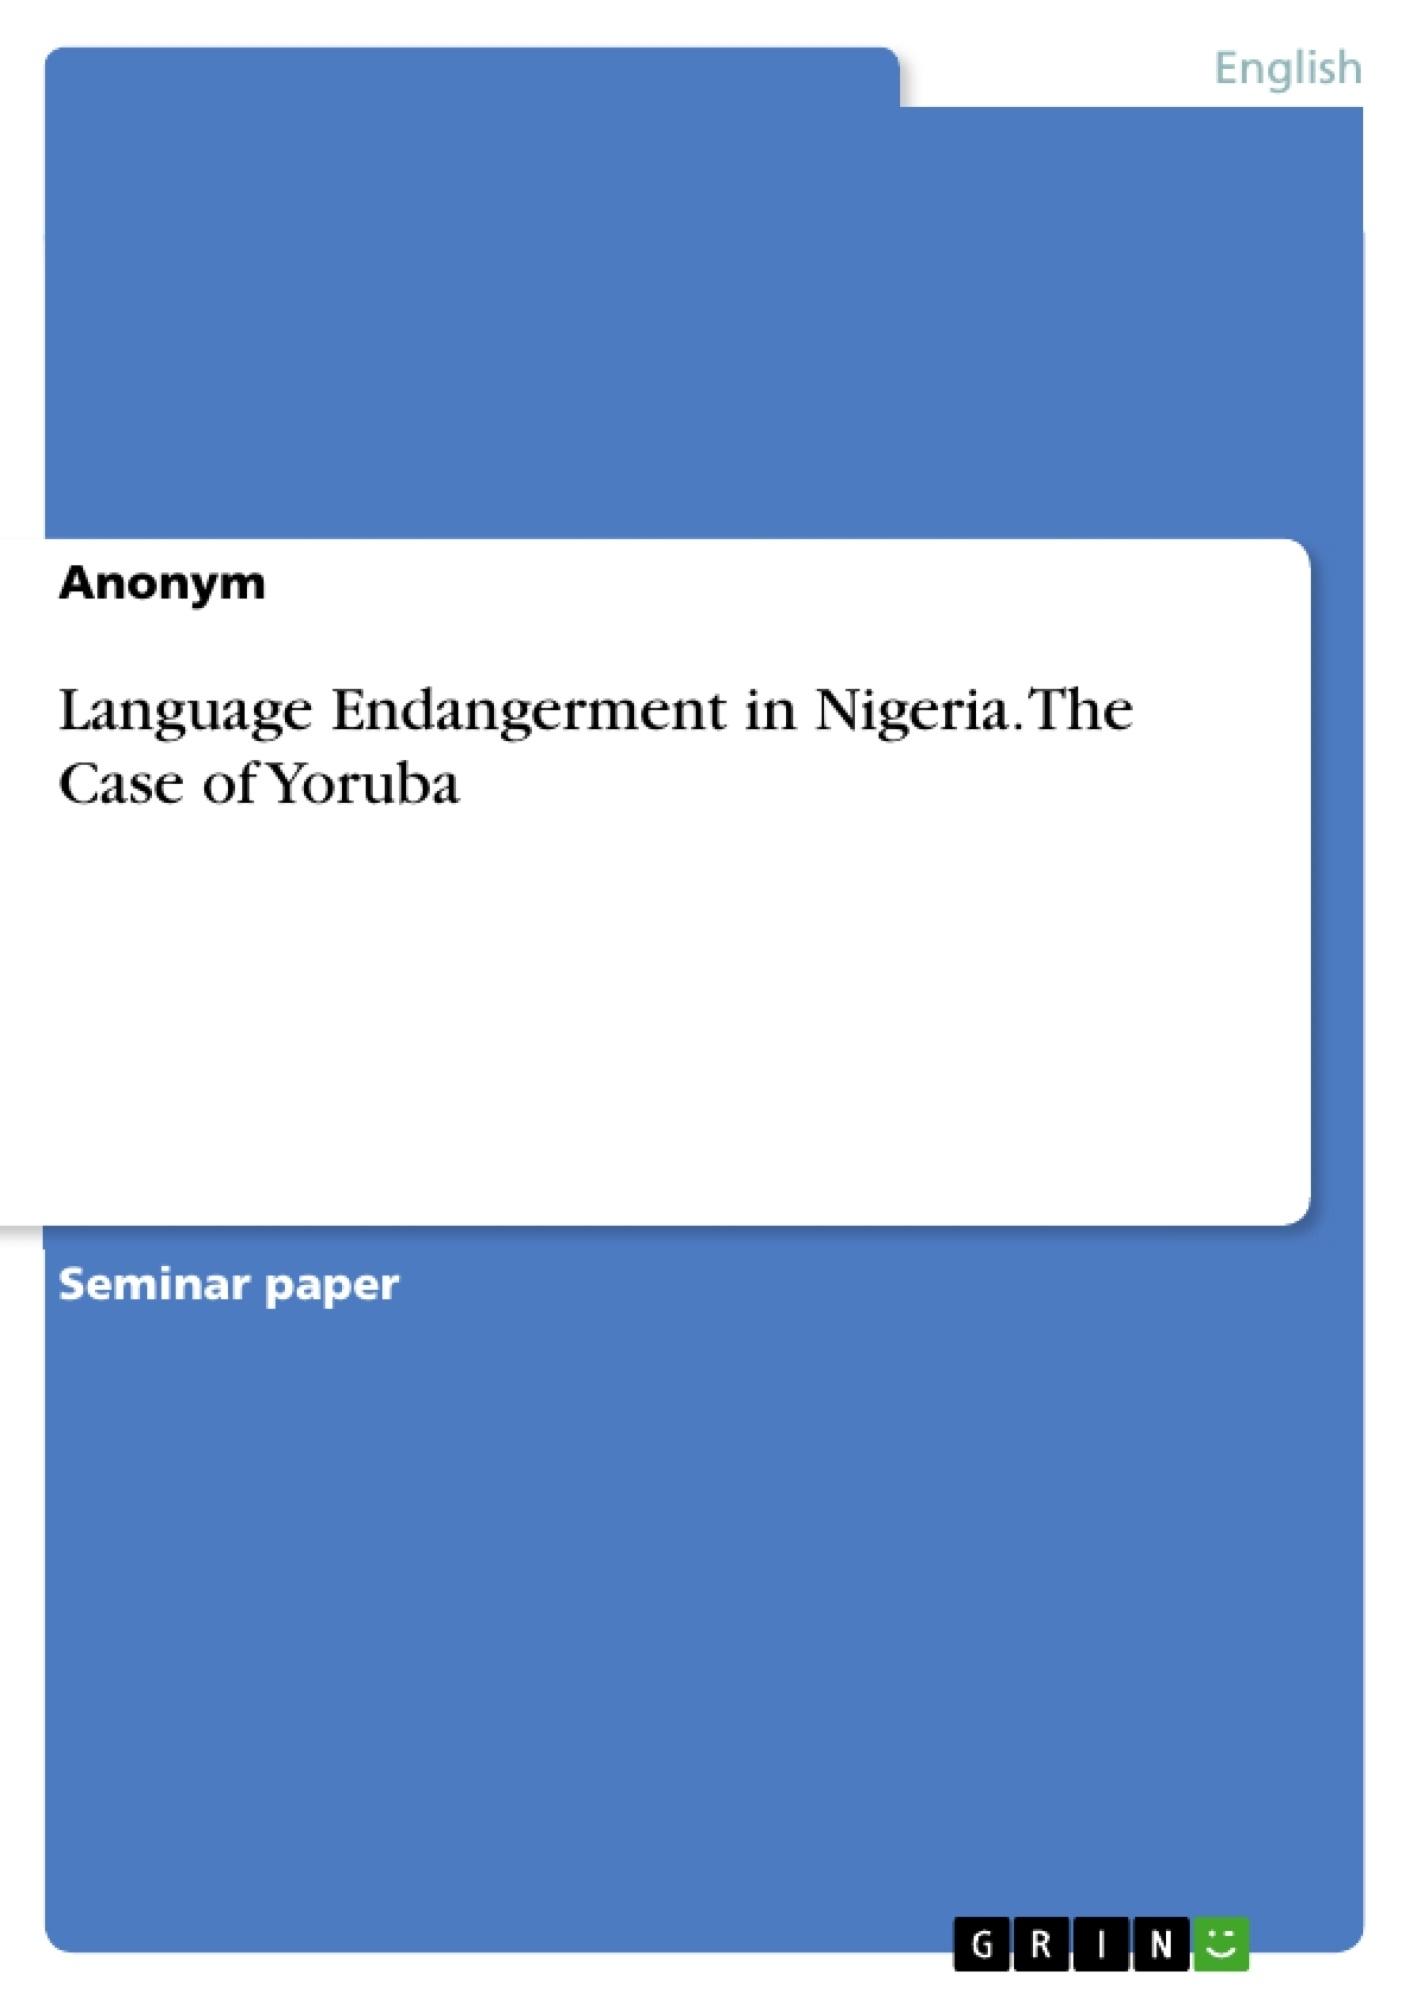 Title: Language Endangerment in Nigeria. The Case of Yoruba